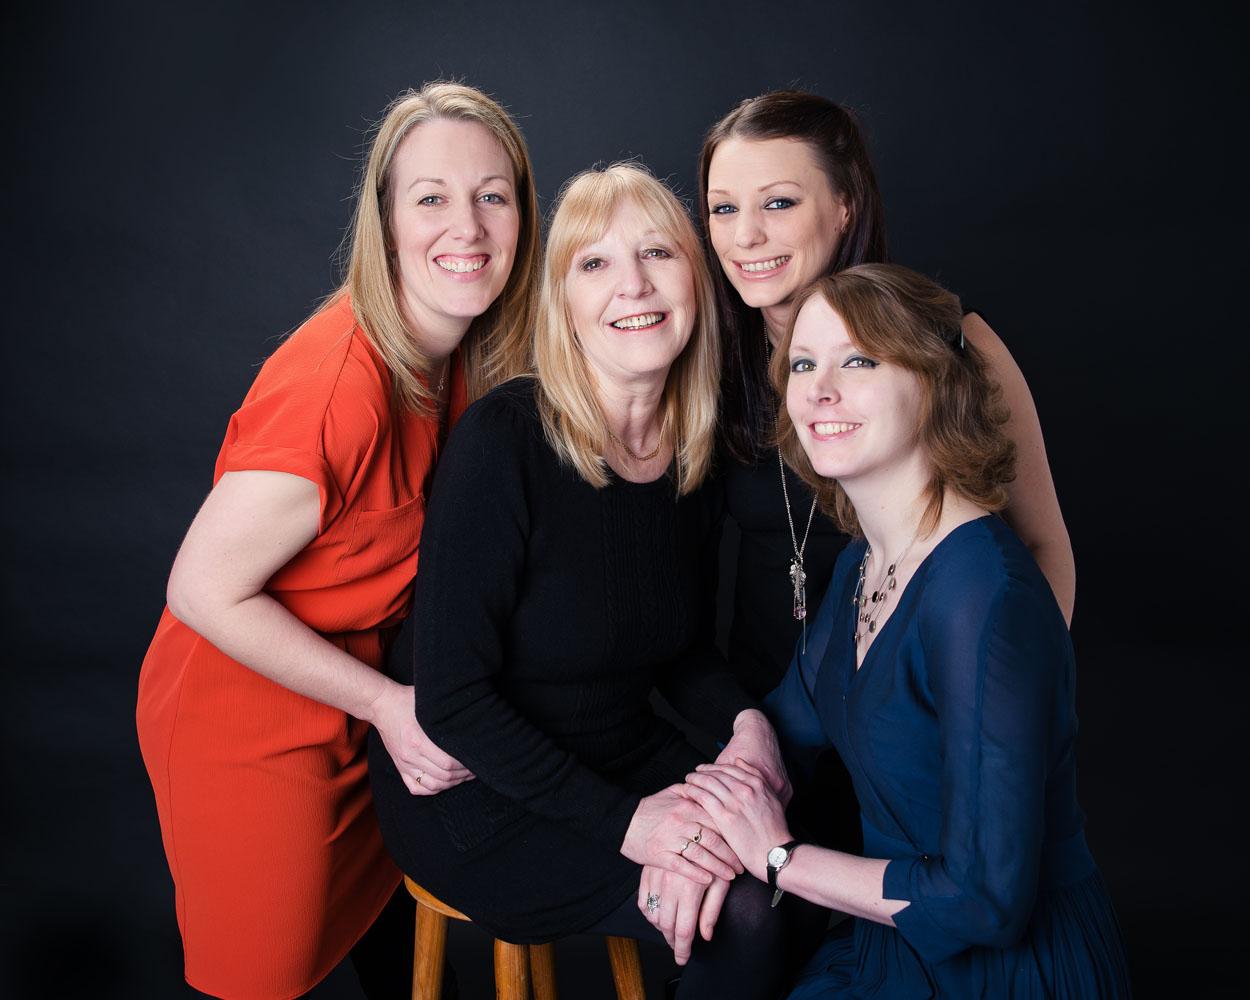 Family photoshoot Nottingham photographer photo studio photography Beeston Nottinghamshire Derby